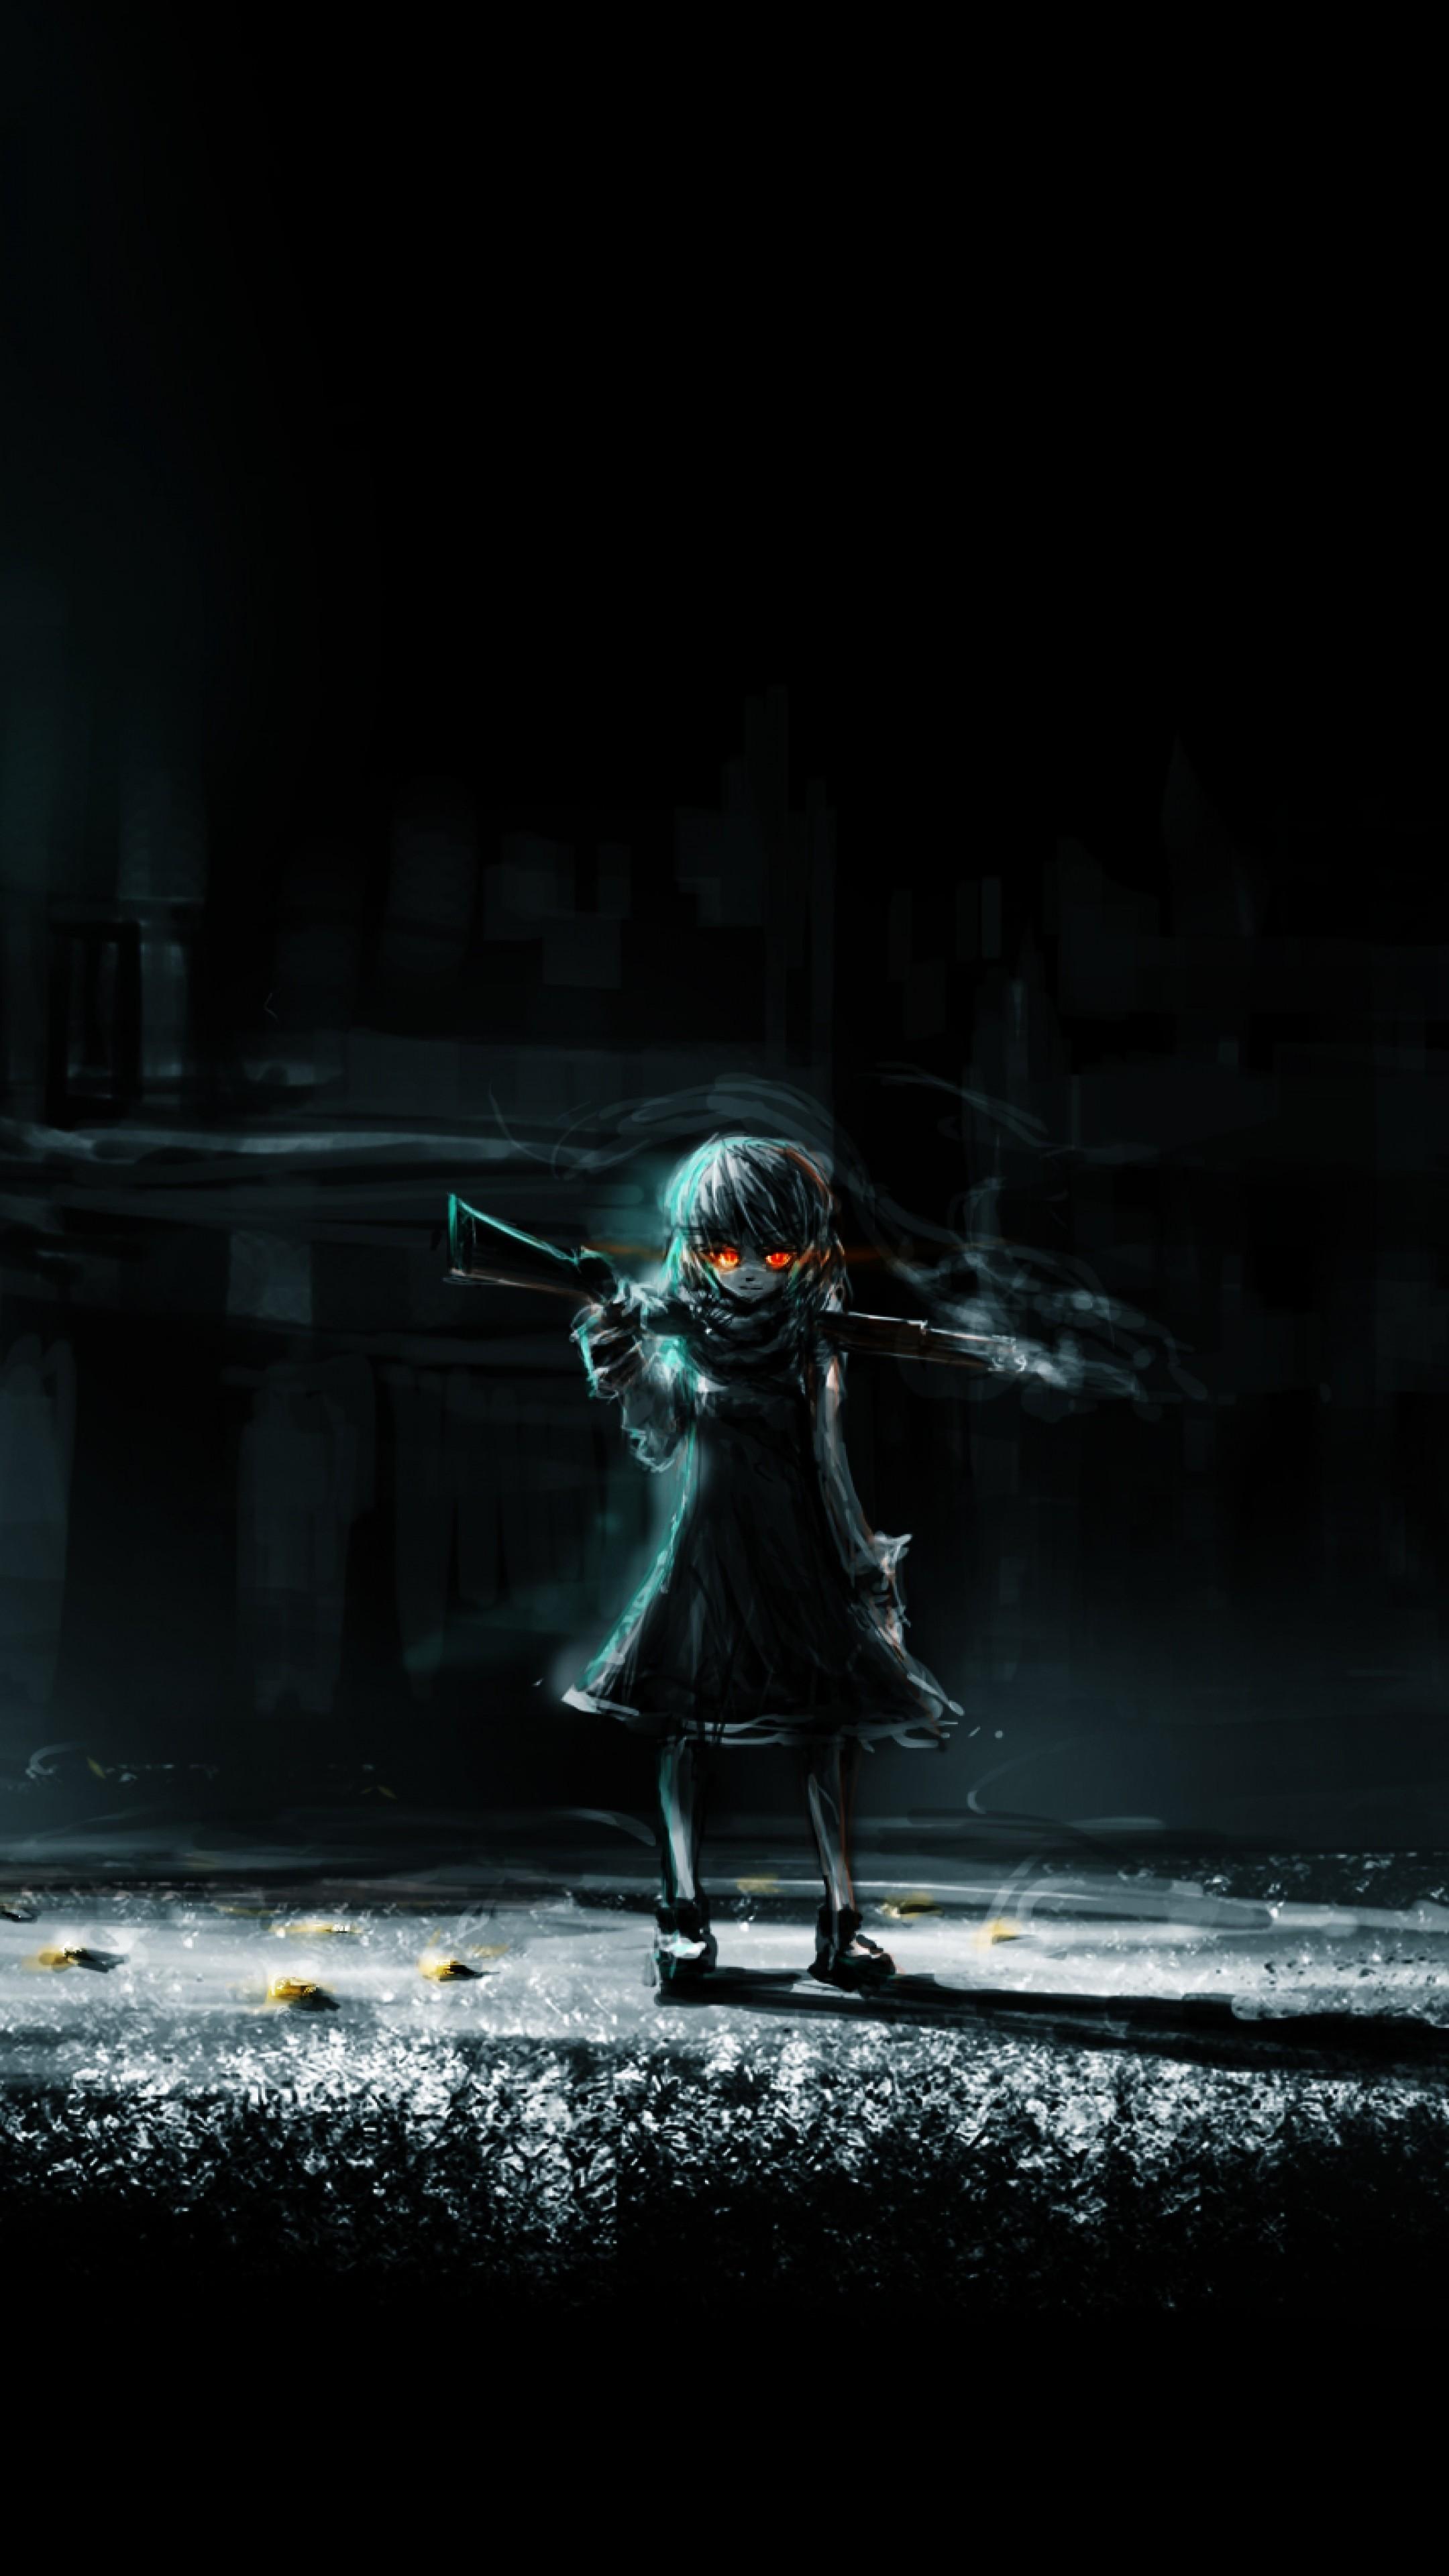 Wallpaper dark anime, girl, art, dark, night